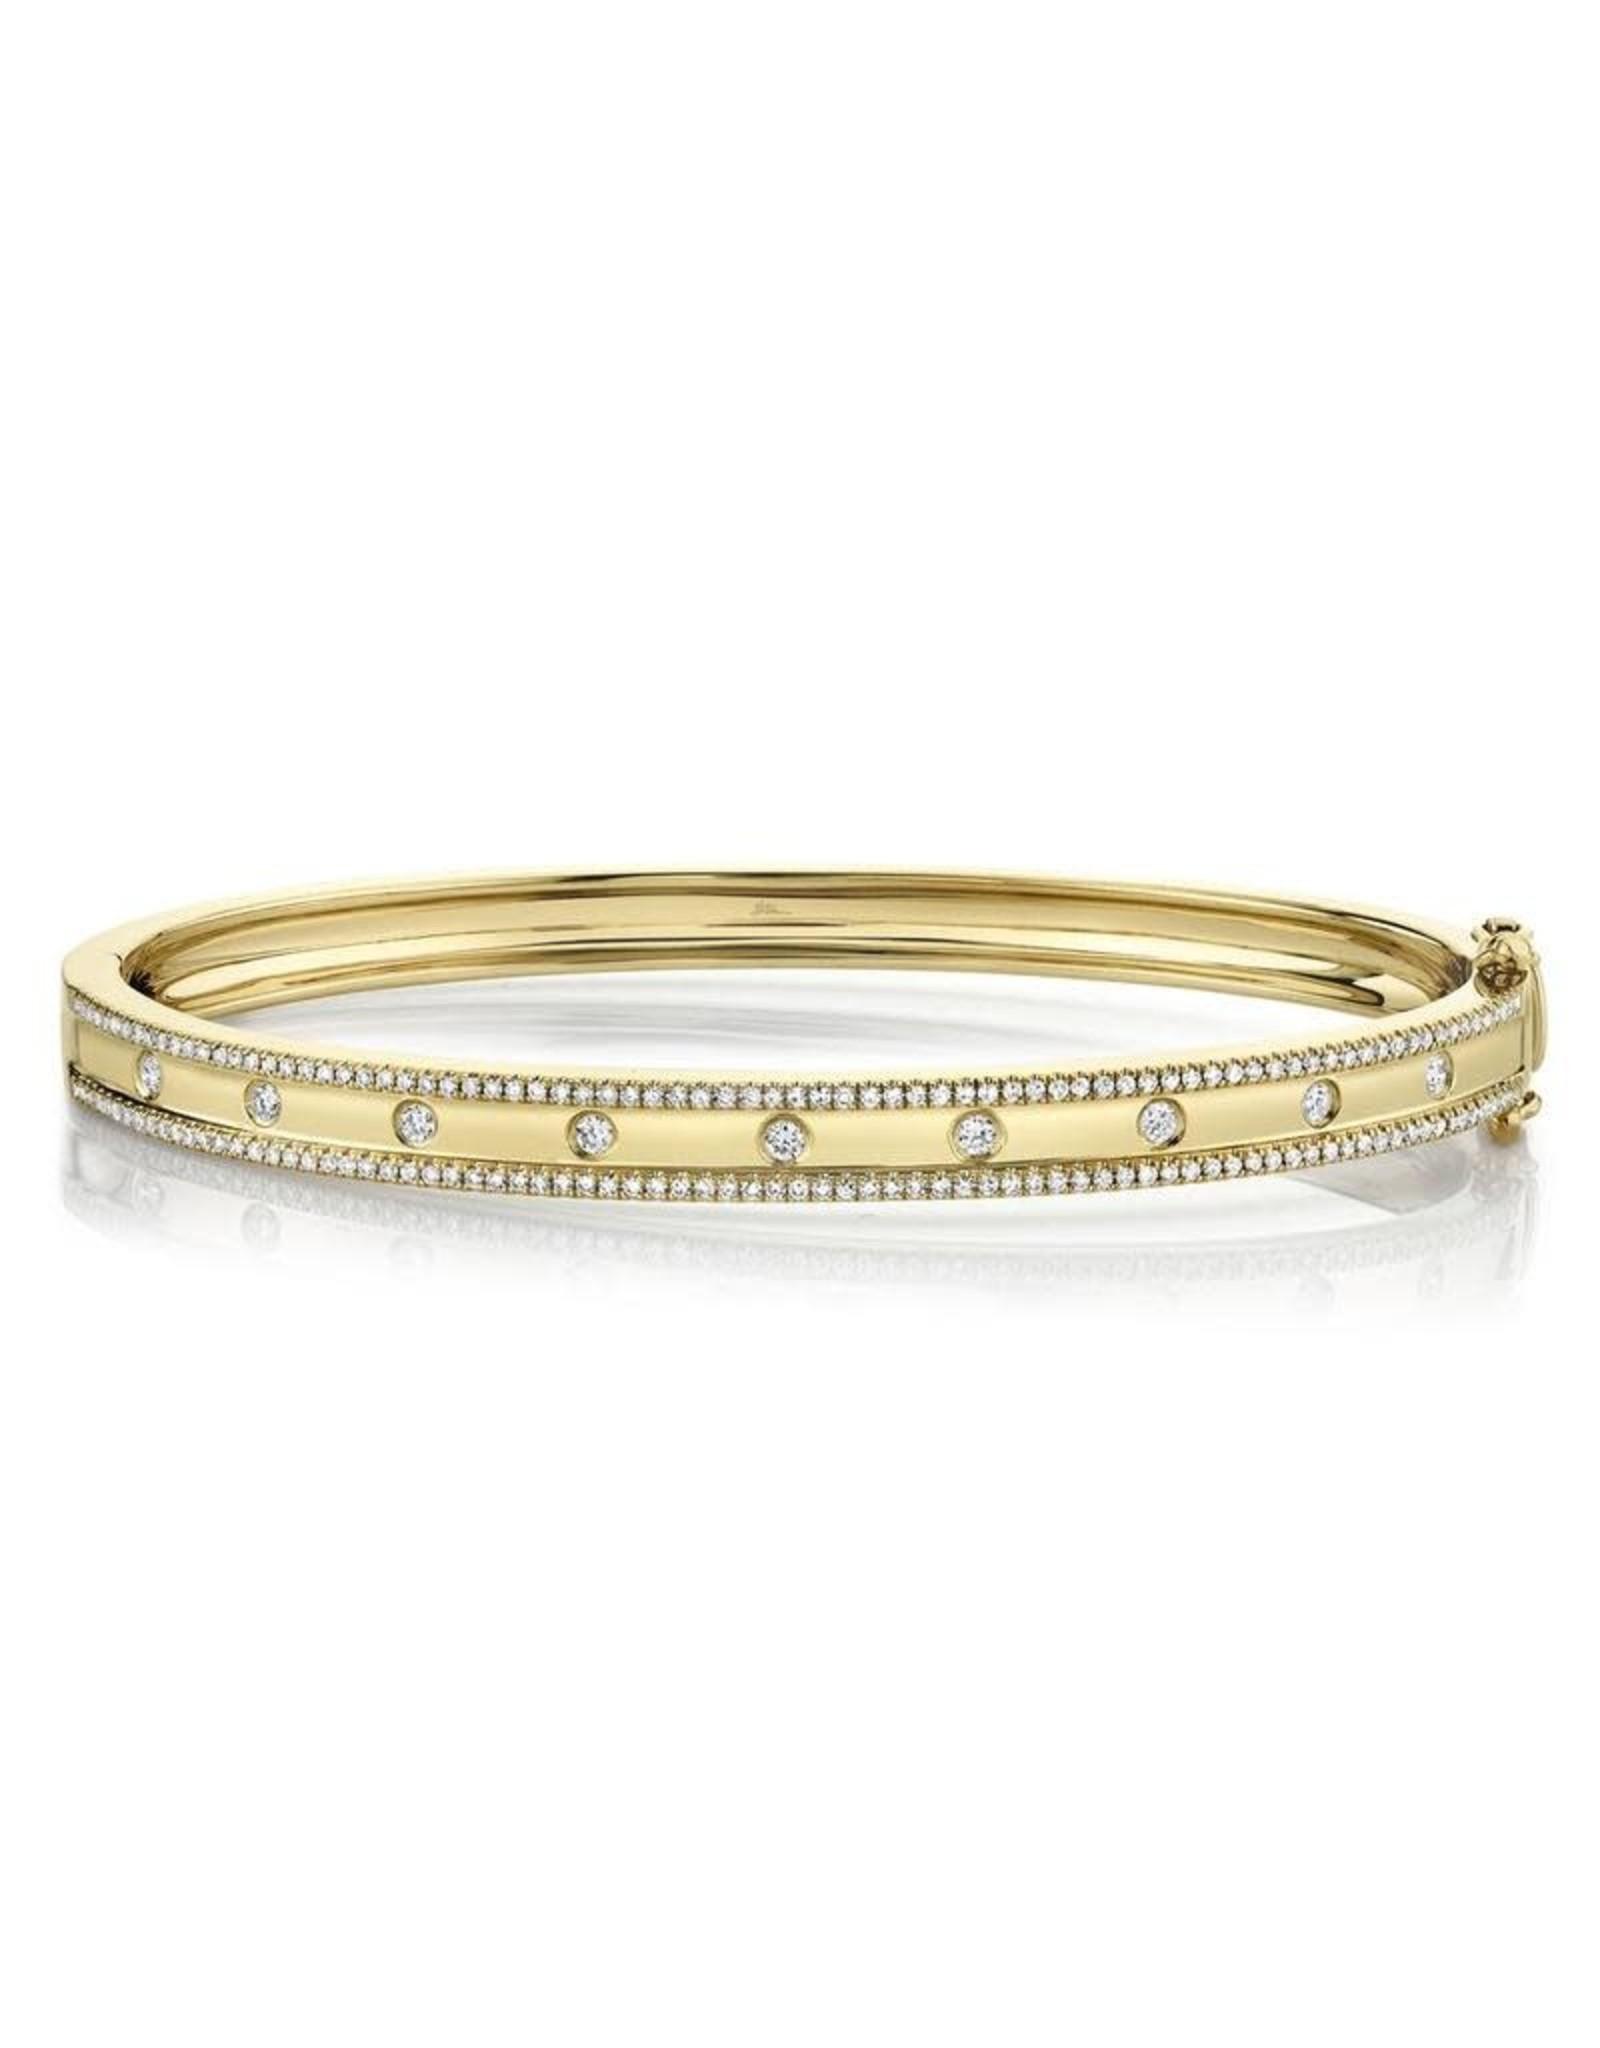 14K Yellow Gold Diamond Bangle Bracelet, D: 0.62ct